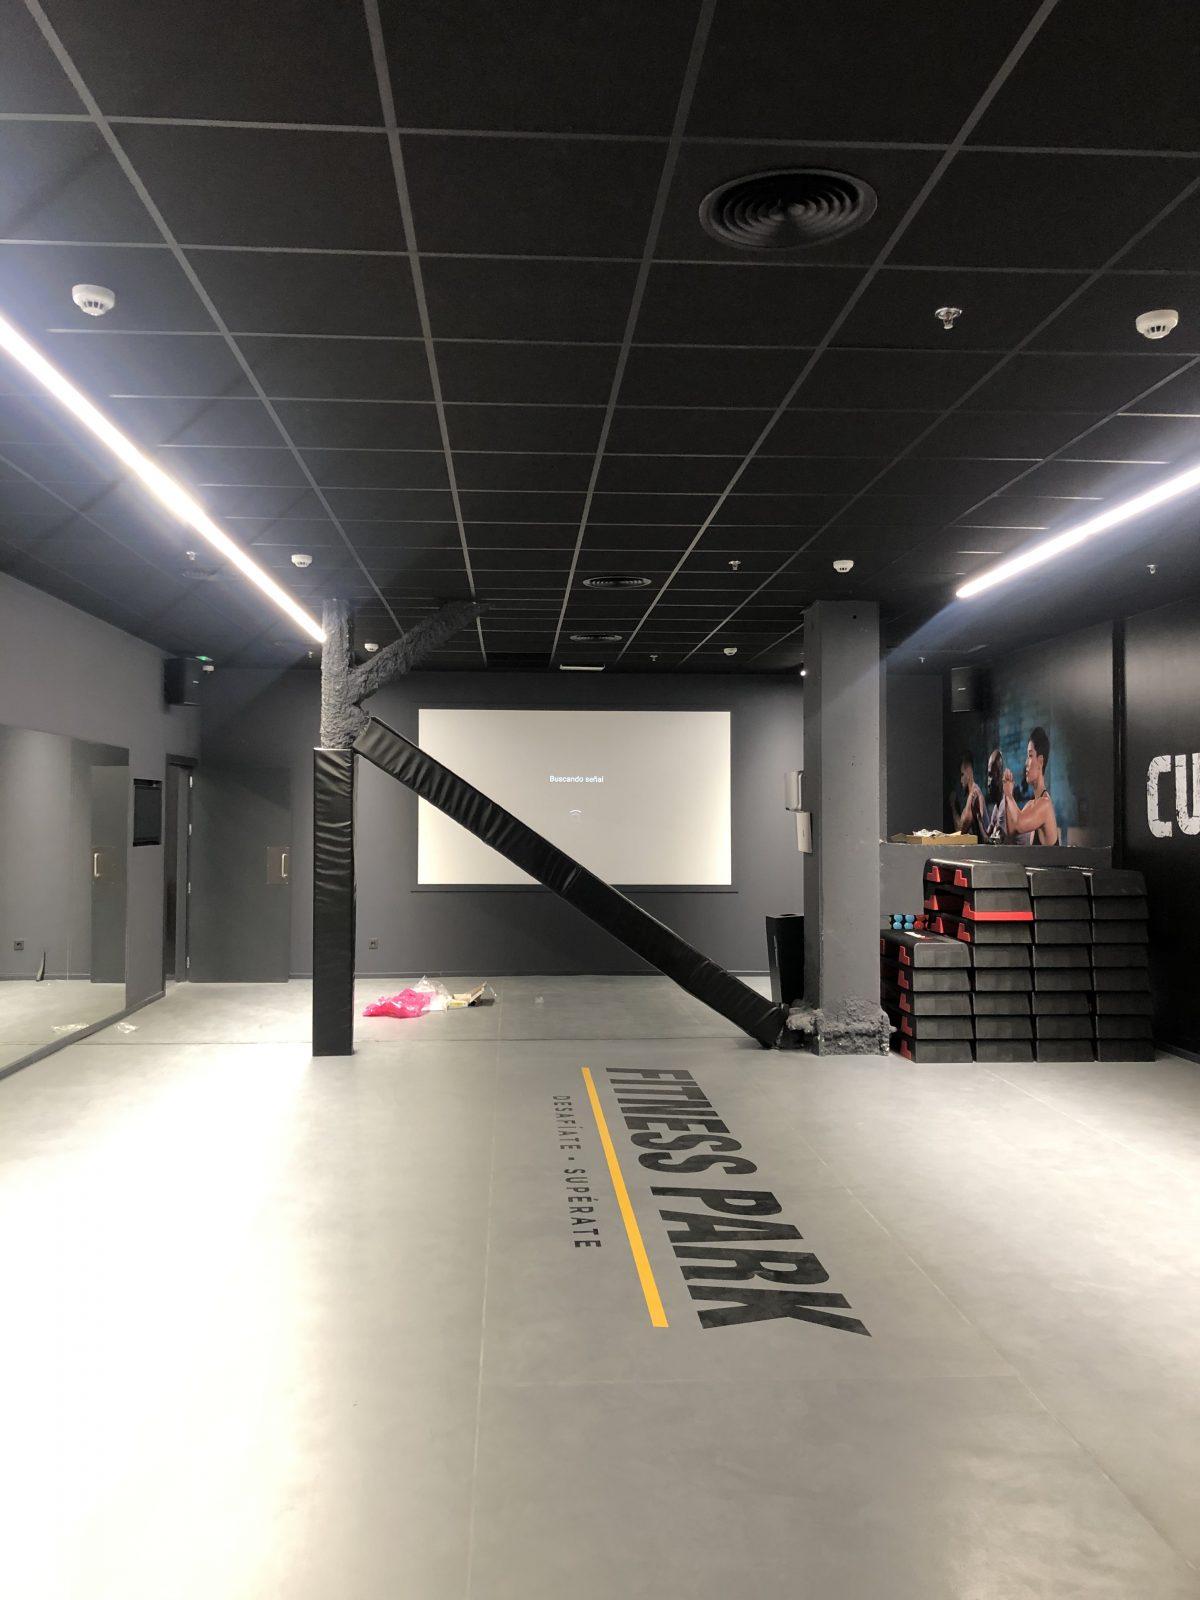 Gimnasio FITNESS PARK.Centro comercial X-Madrid. Alcorcon